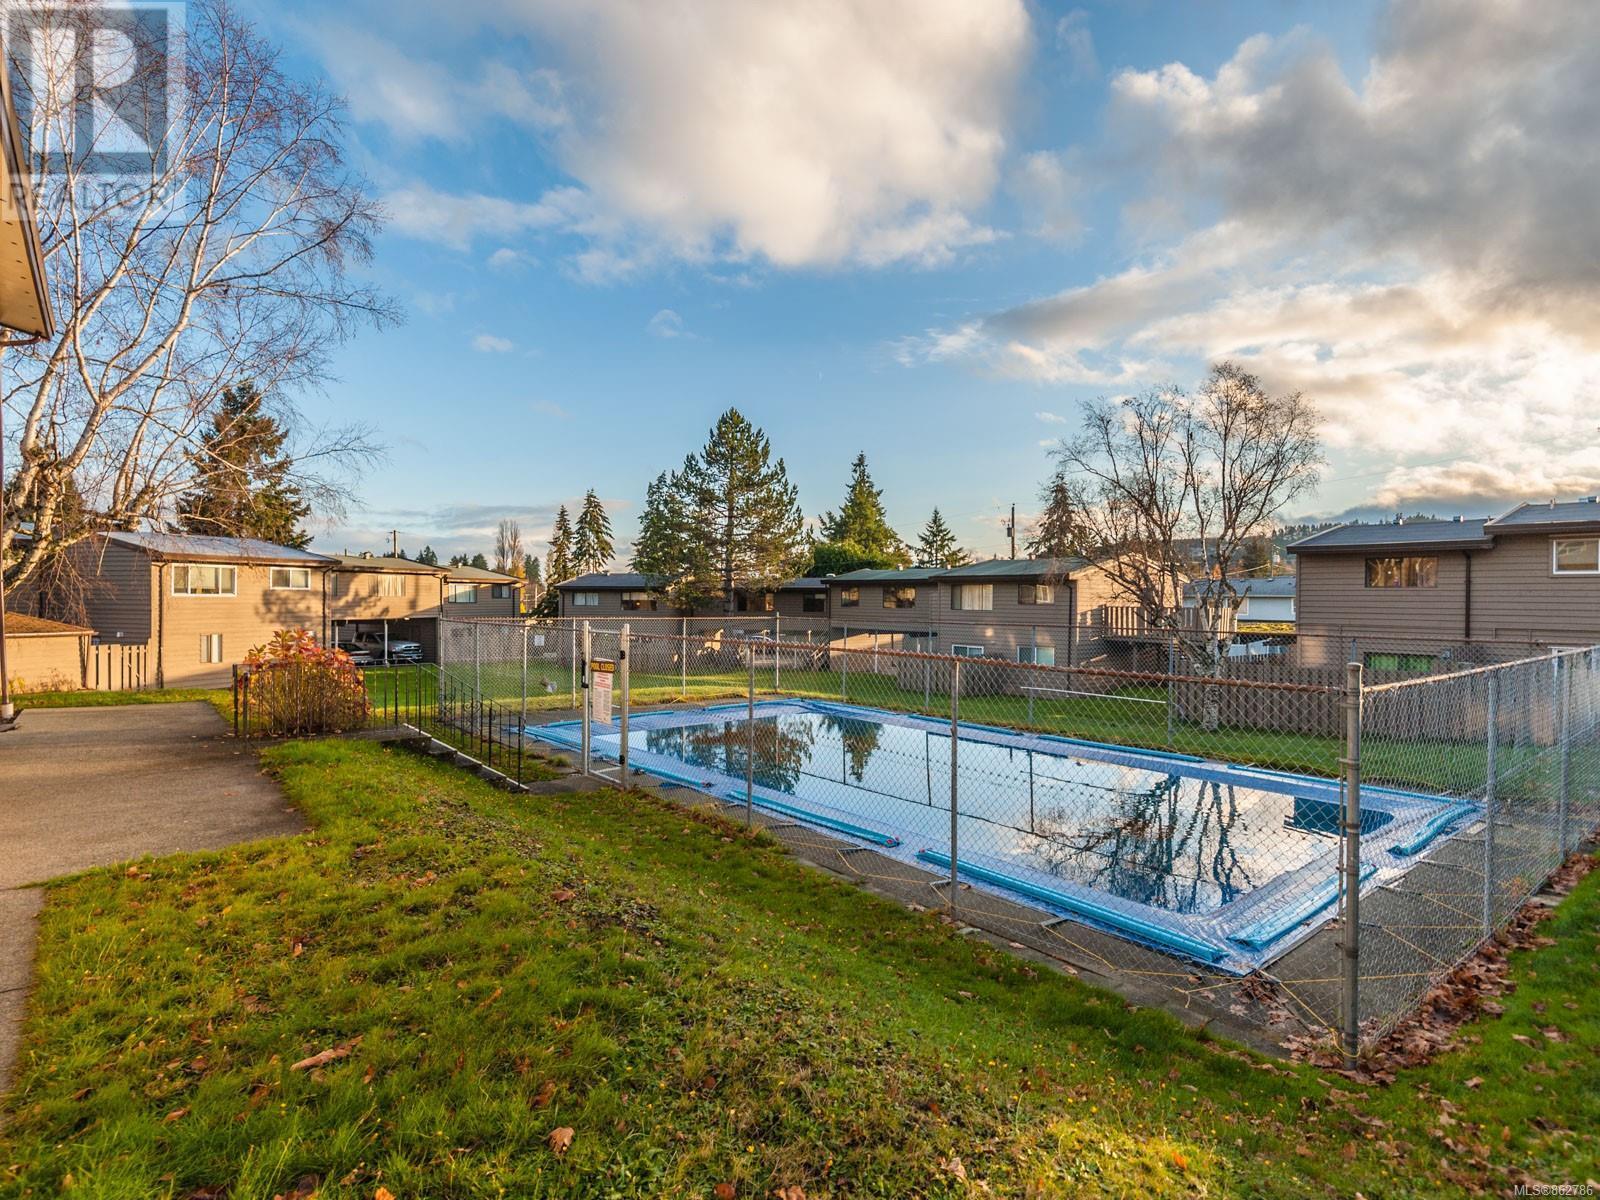 31 25 Pryde Ave, Nanaimo, British Columbia  V9S 4R5 - Photo 23 - 862786